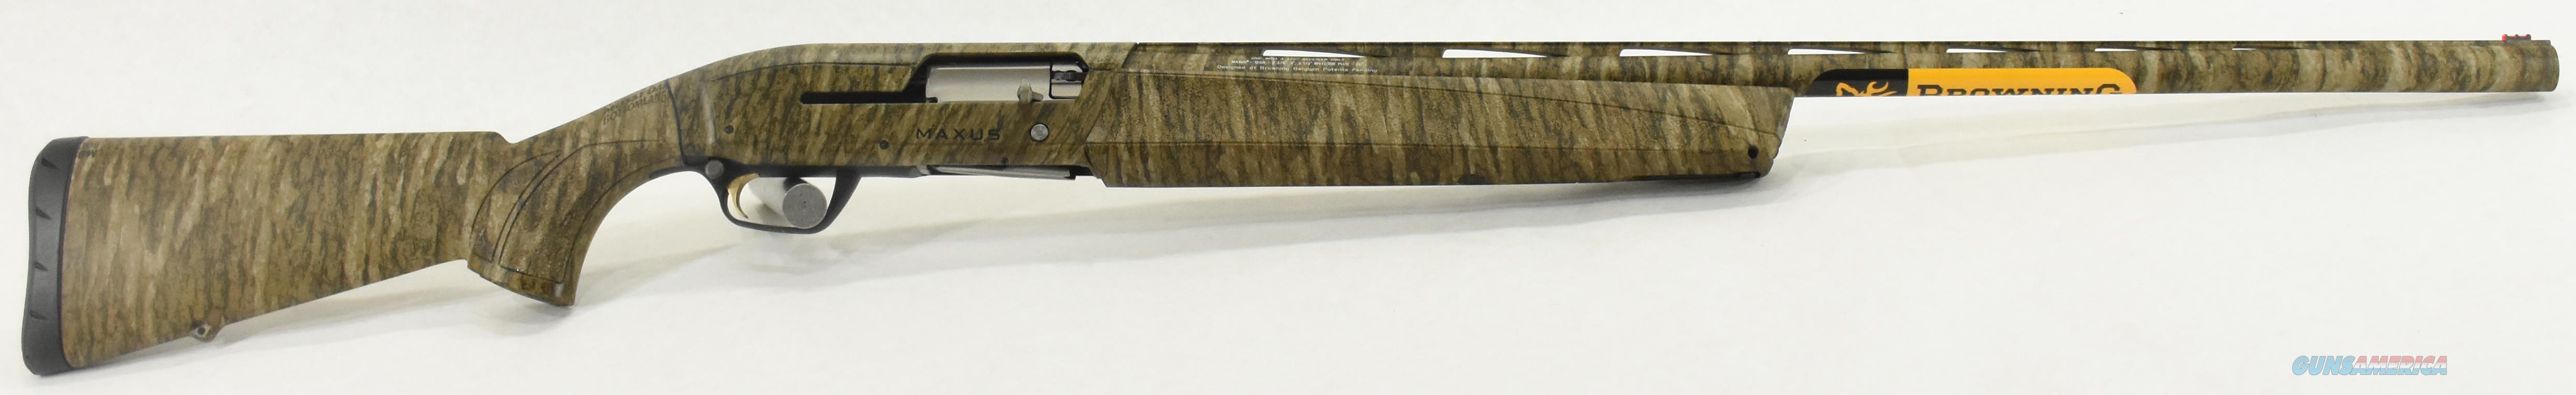 Maxus MOBL 12Ga 28-3.5In 011654204  Guns > Shotguns > Browning Shotguns > Autoloaders > Hunting